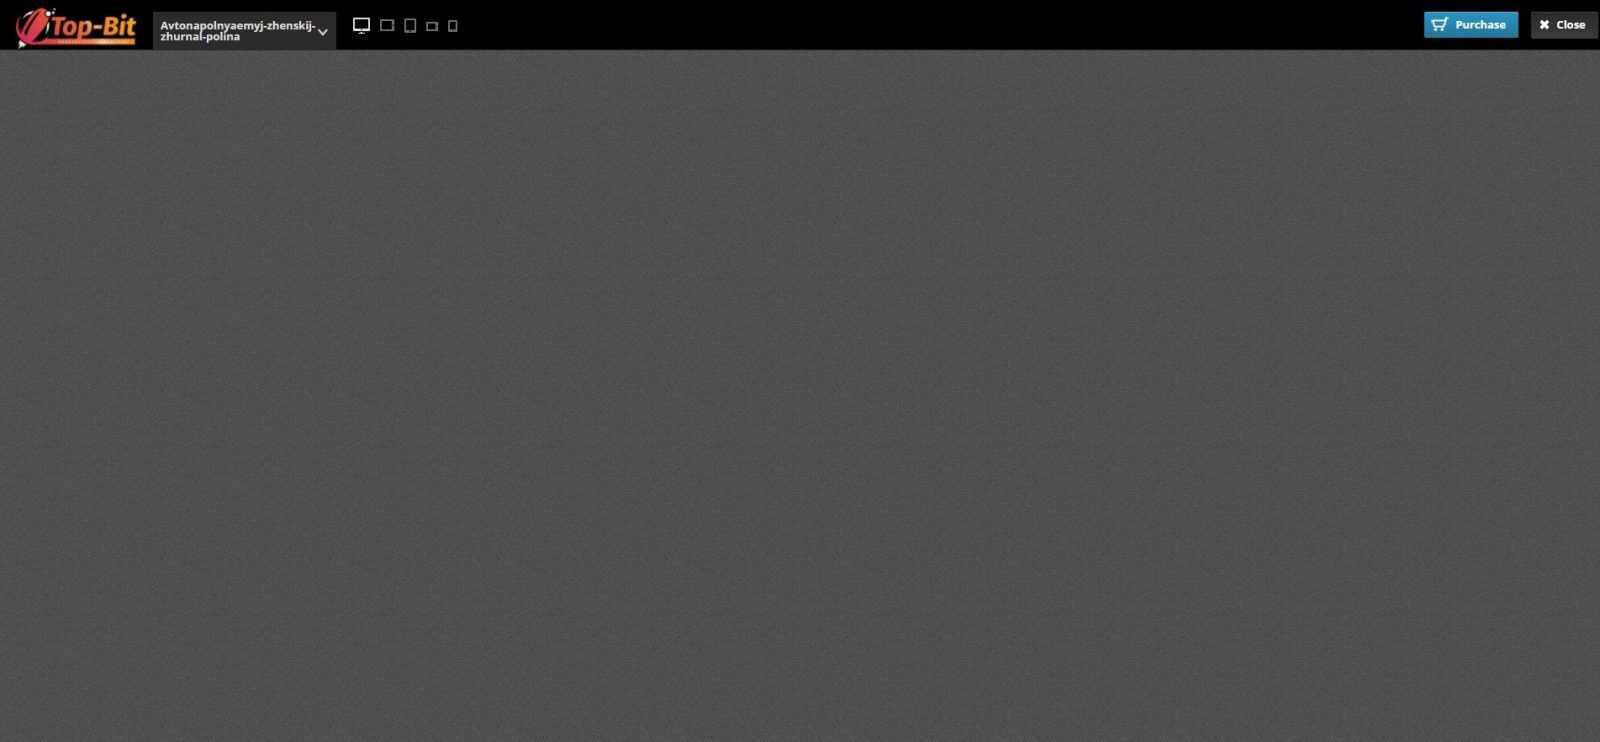 Проблема при просмотре демоверсий Top-Bit